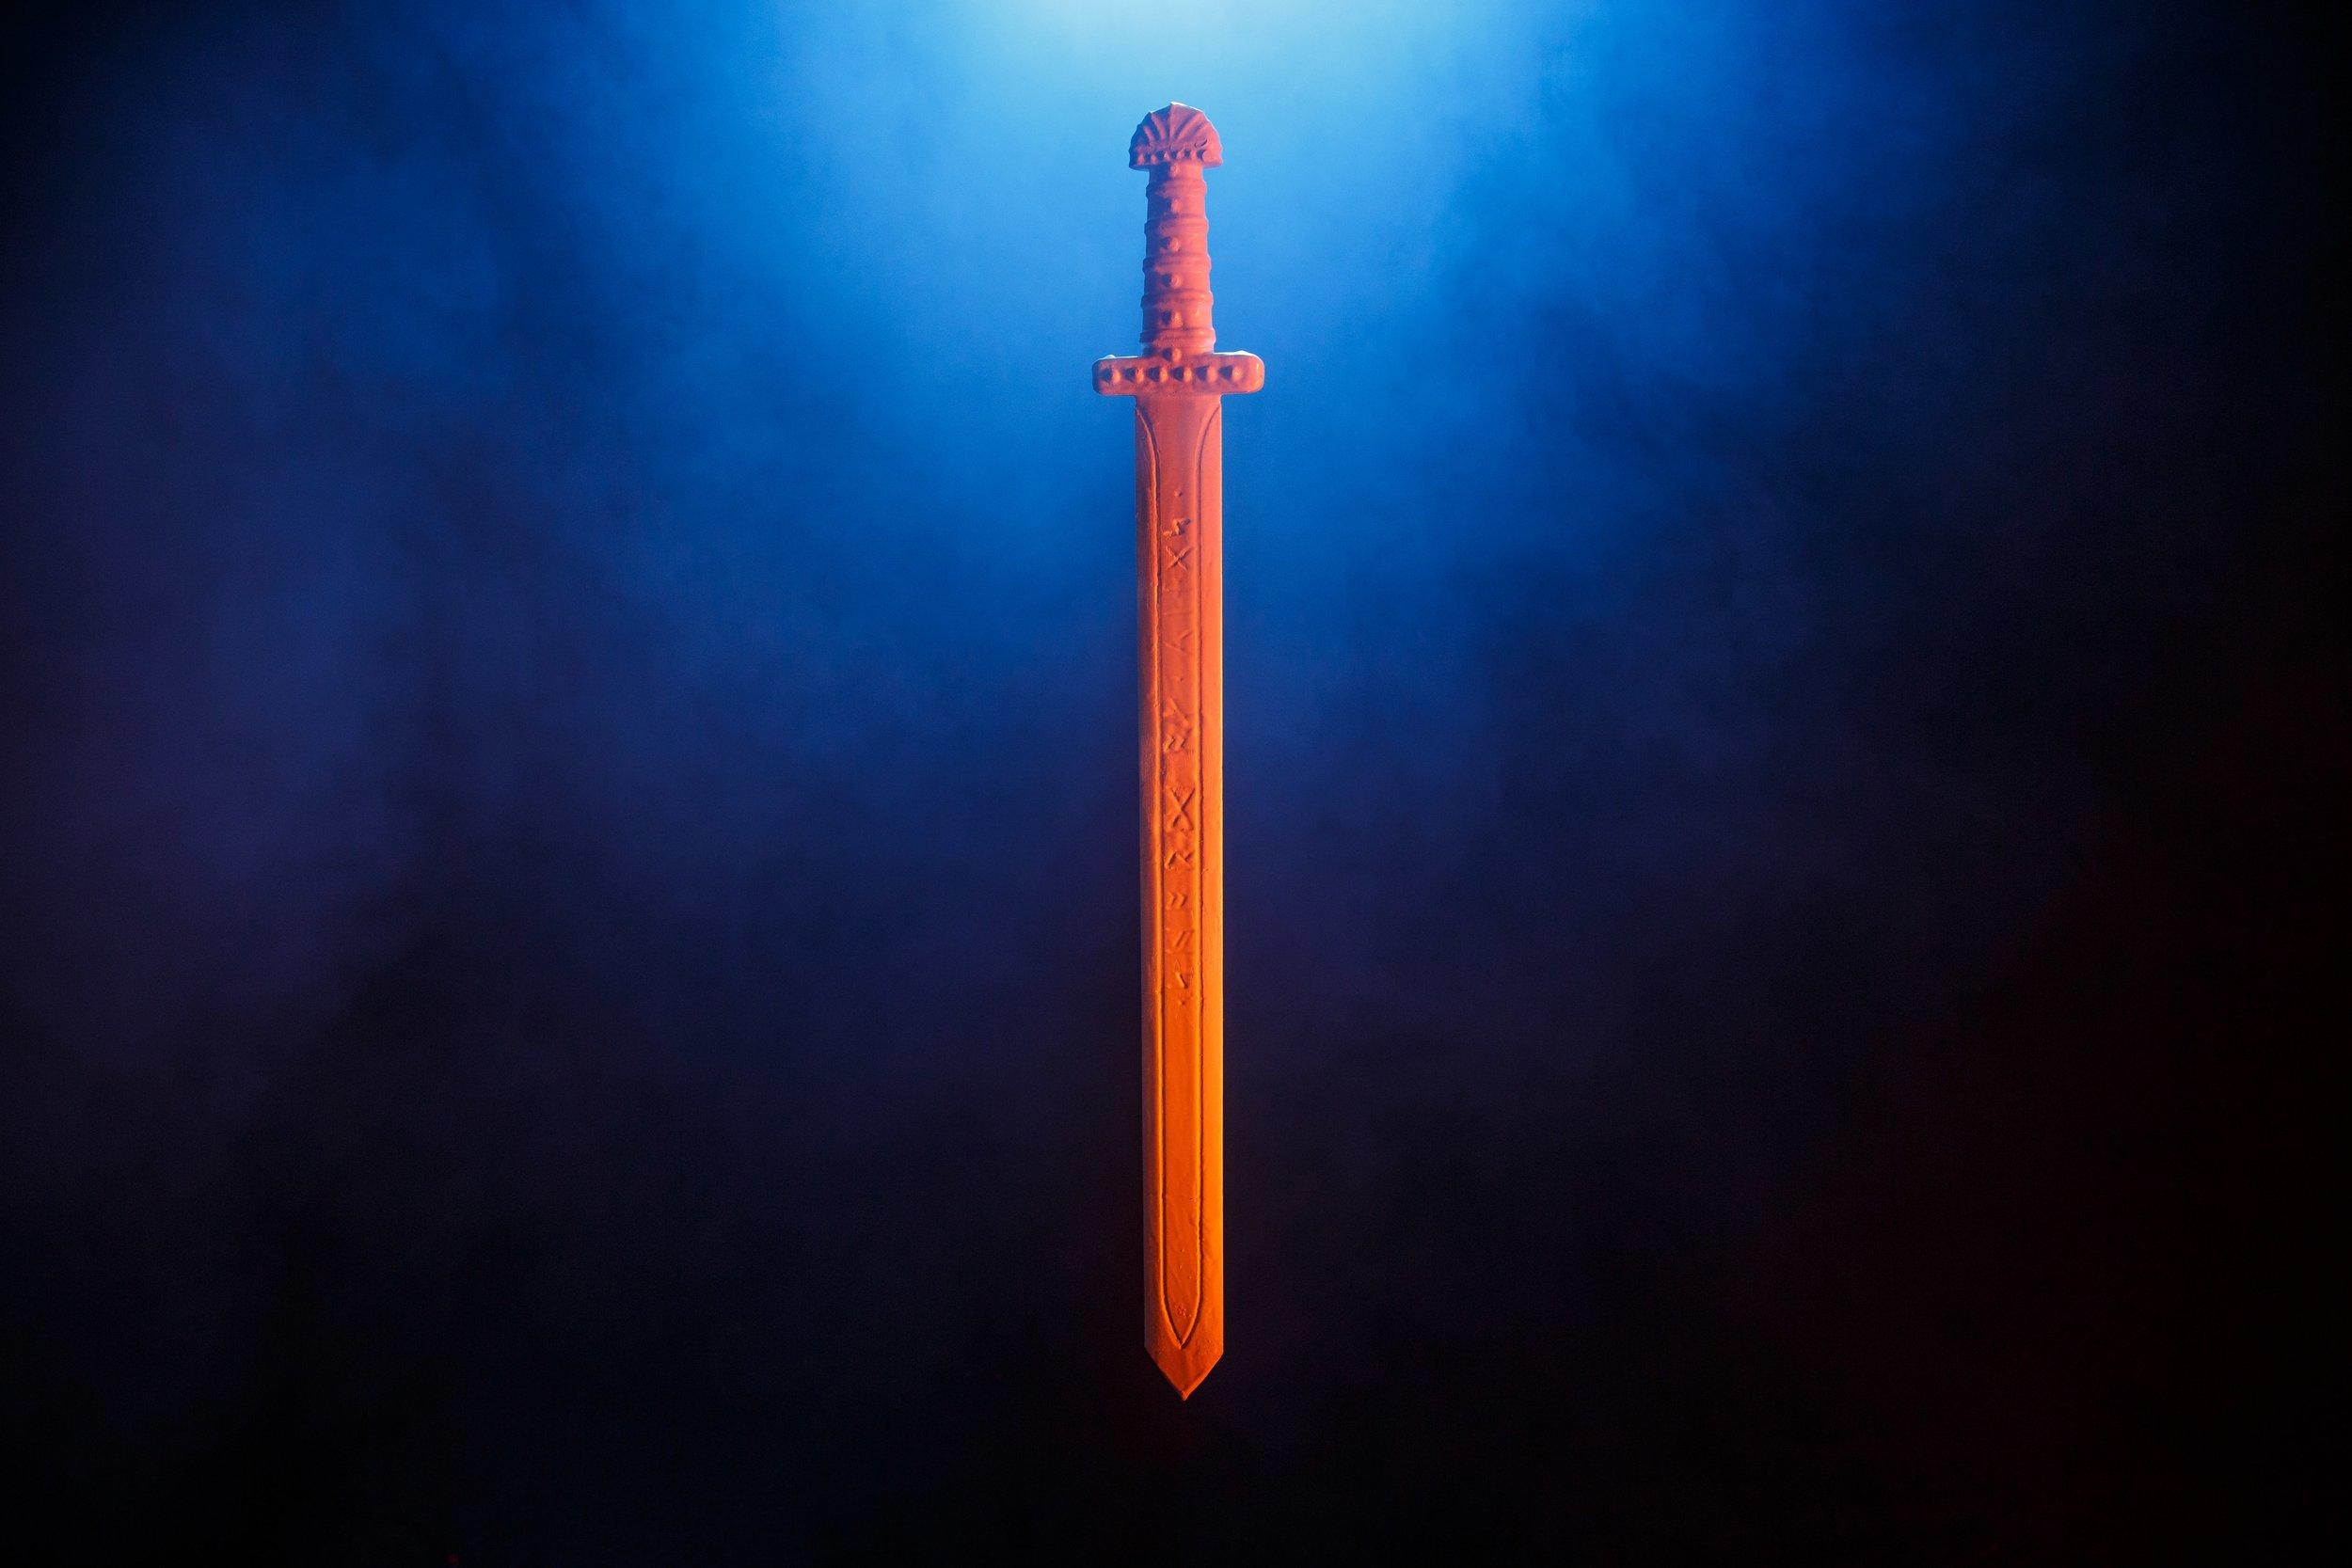 History Vikings 3D print Sword Prop